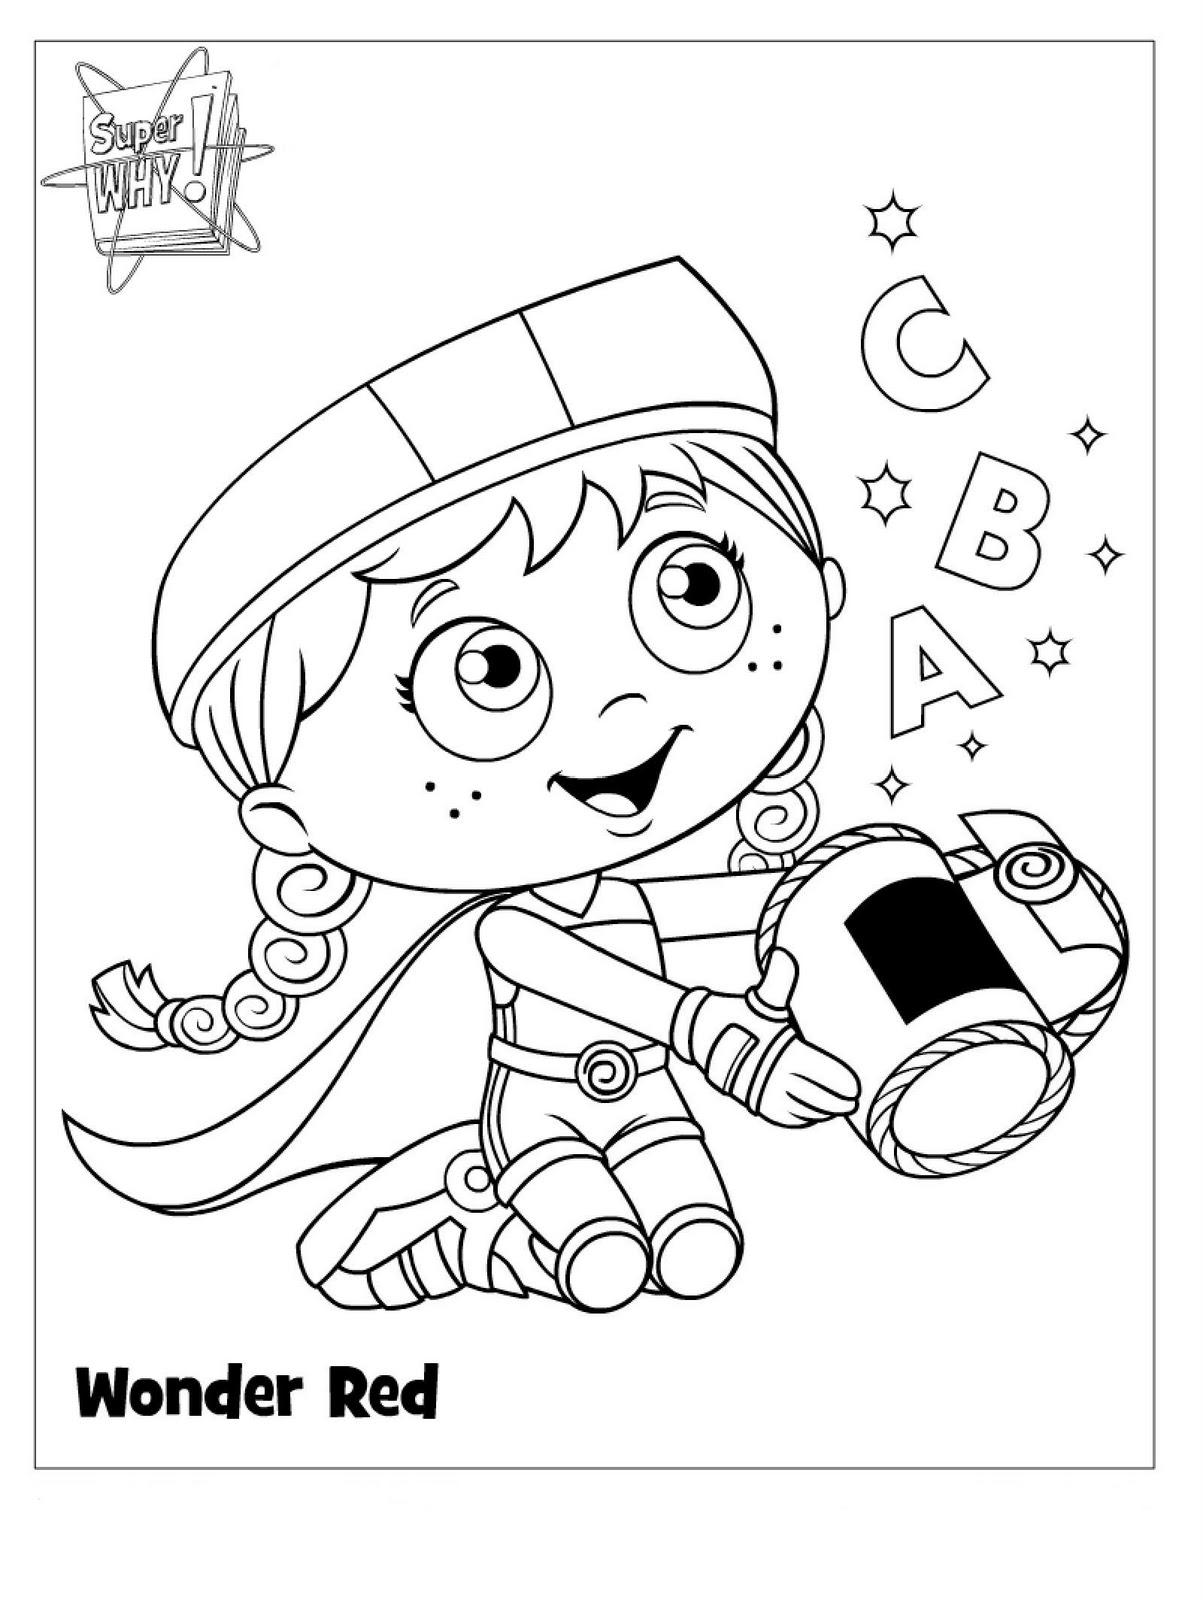 super y coloring pages - photo#30